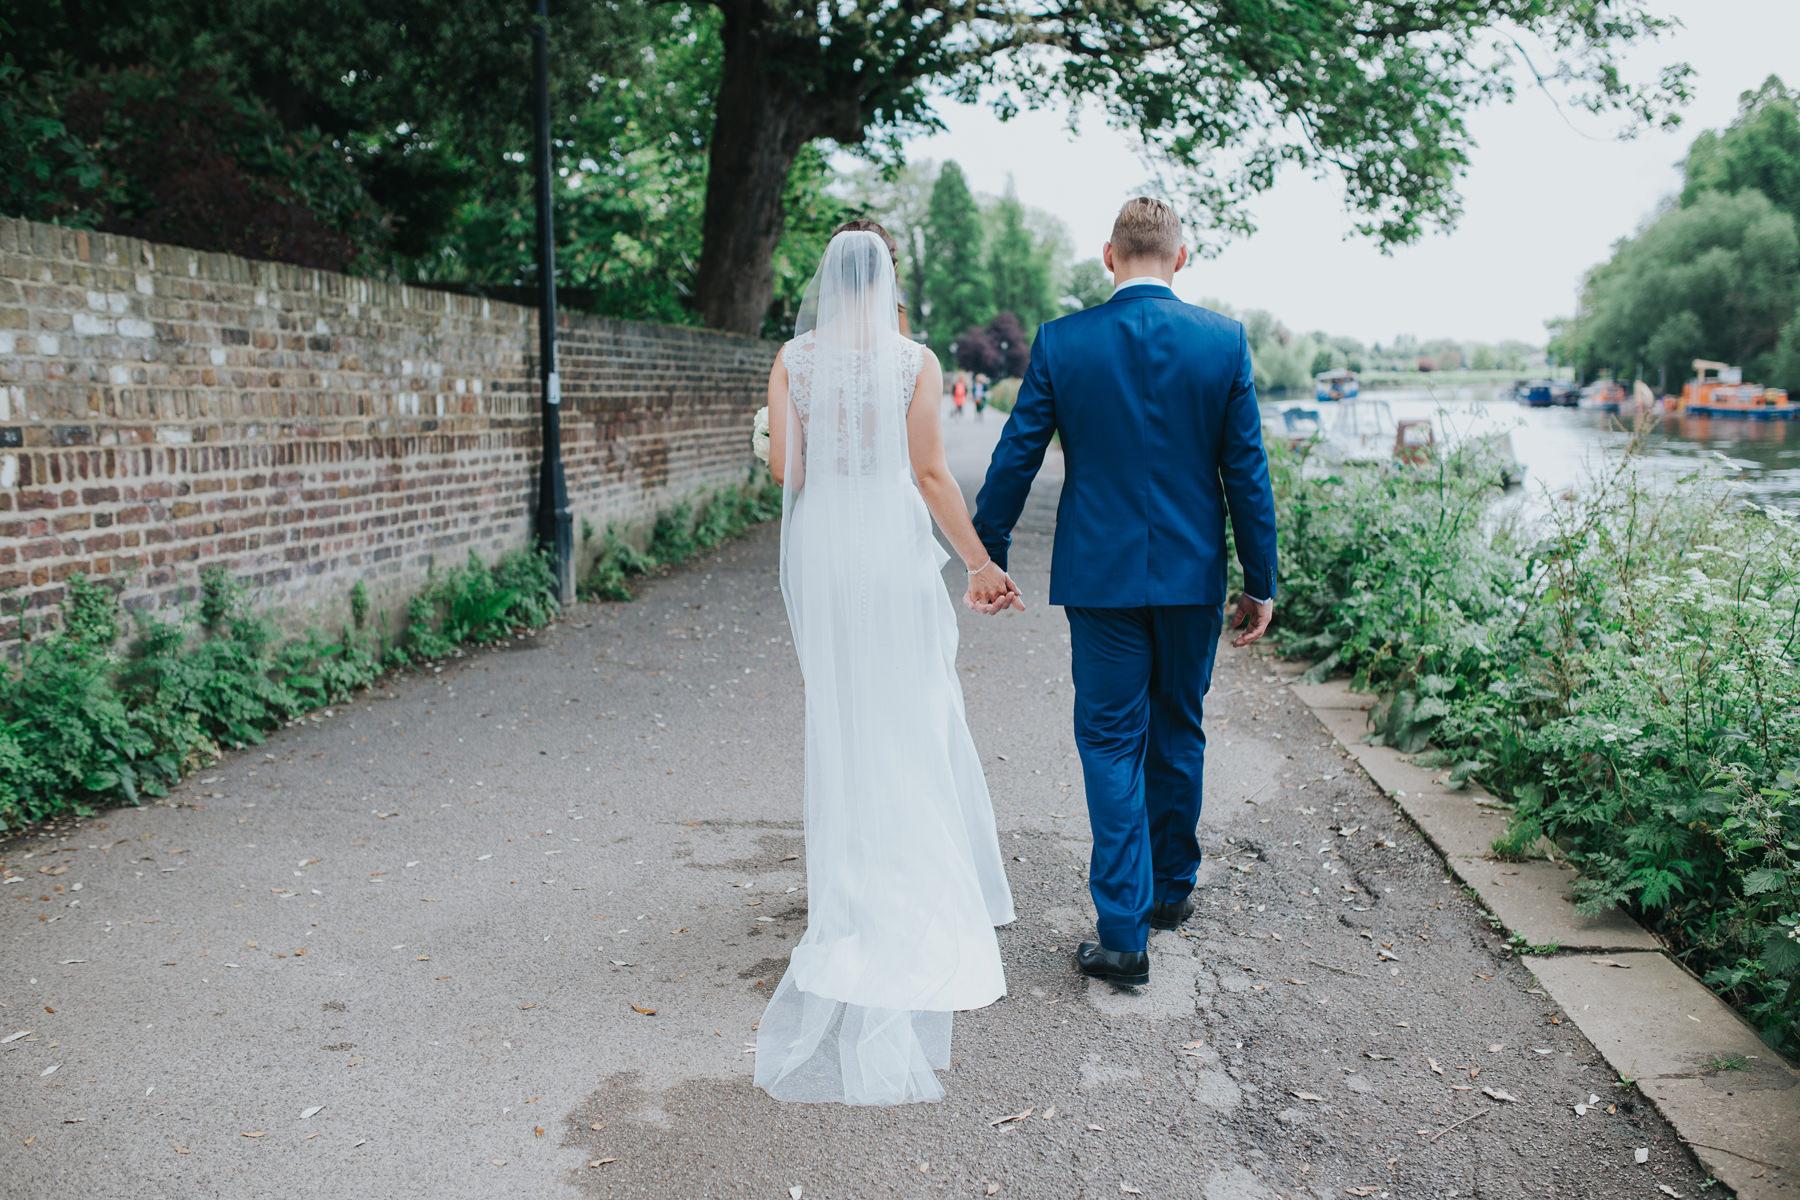 CRL-364-The Bingham wedding Richmond-Claire Rob bridal couple portraits on Thamespath.jpg